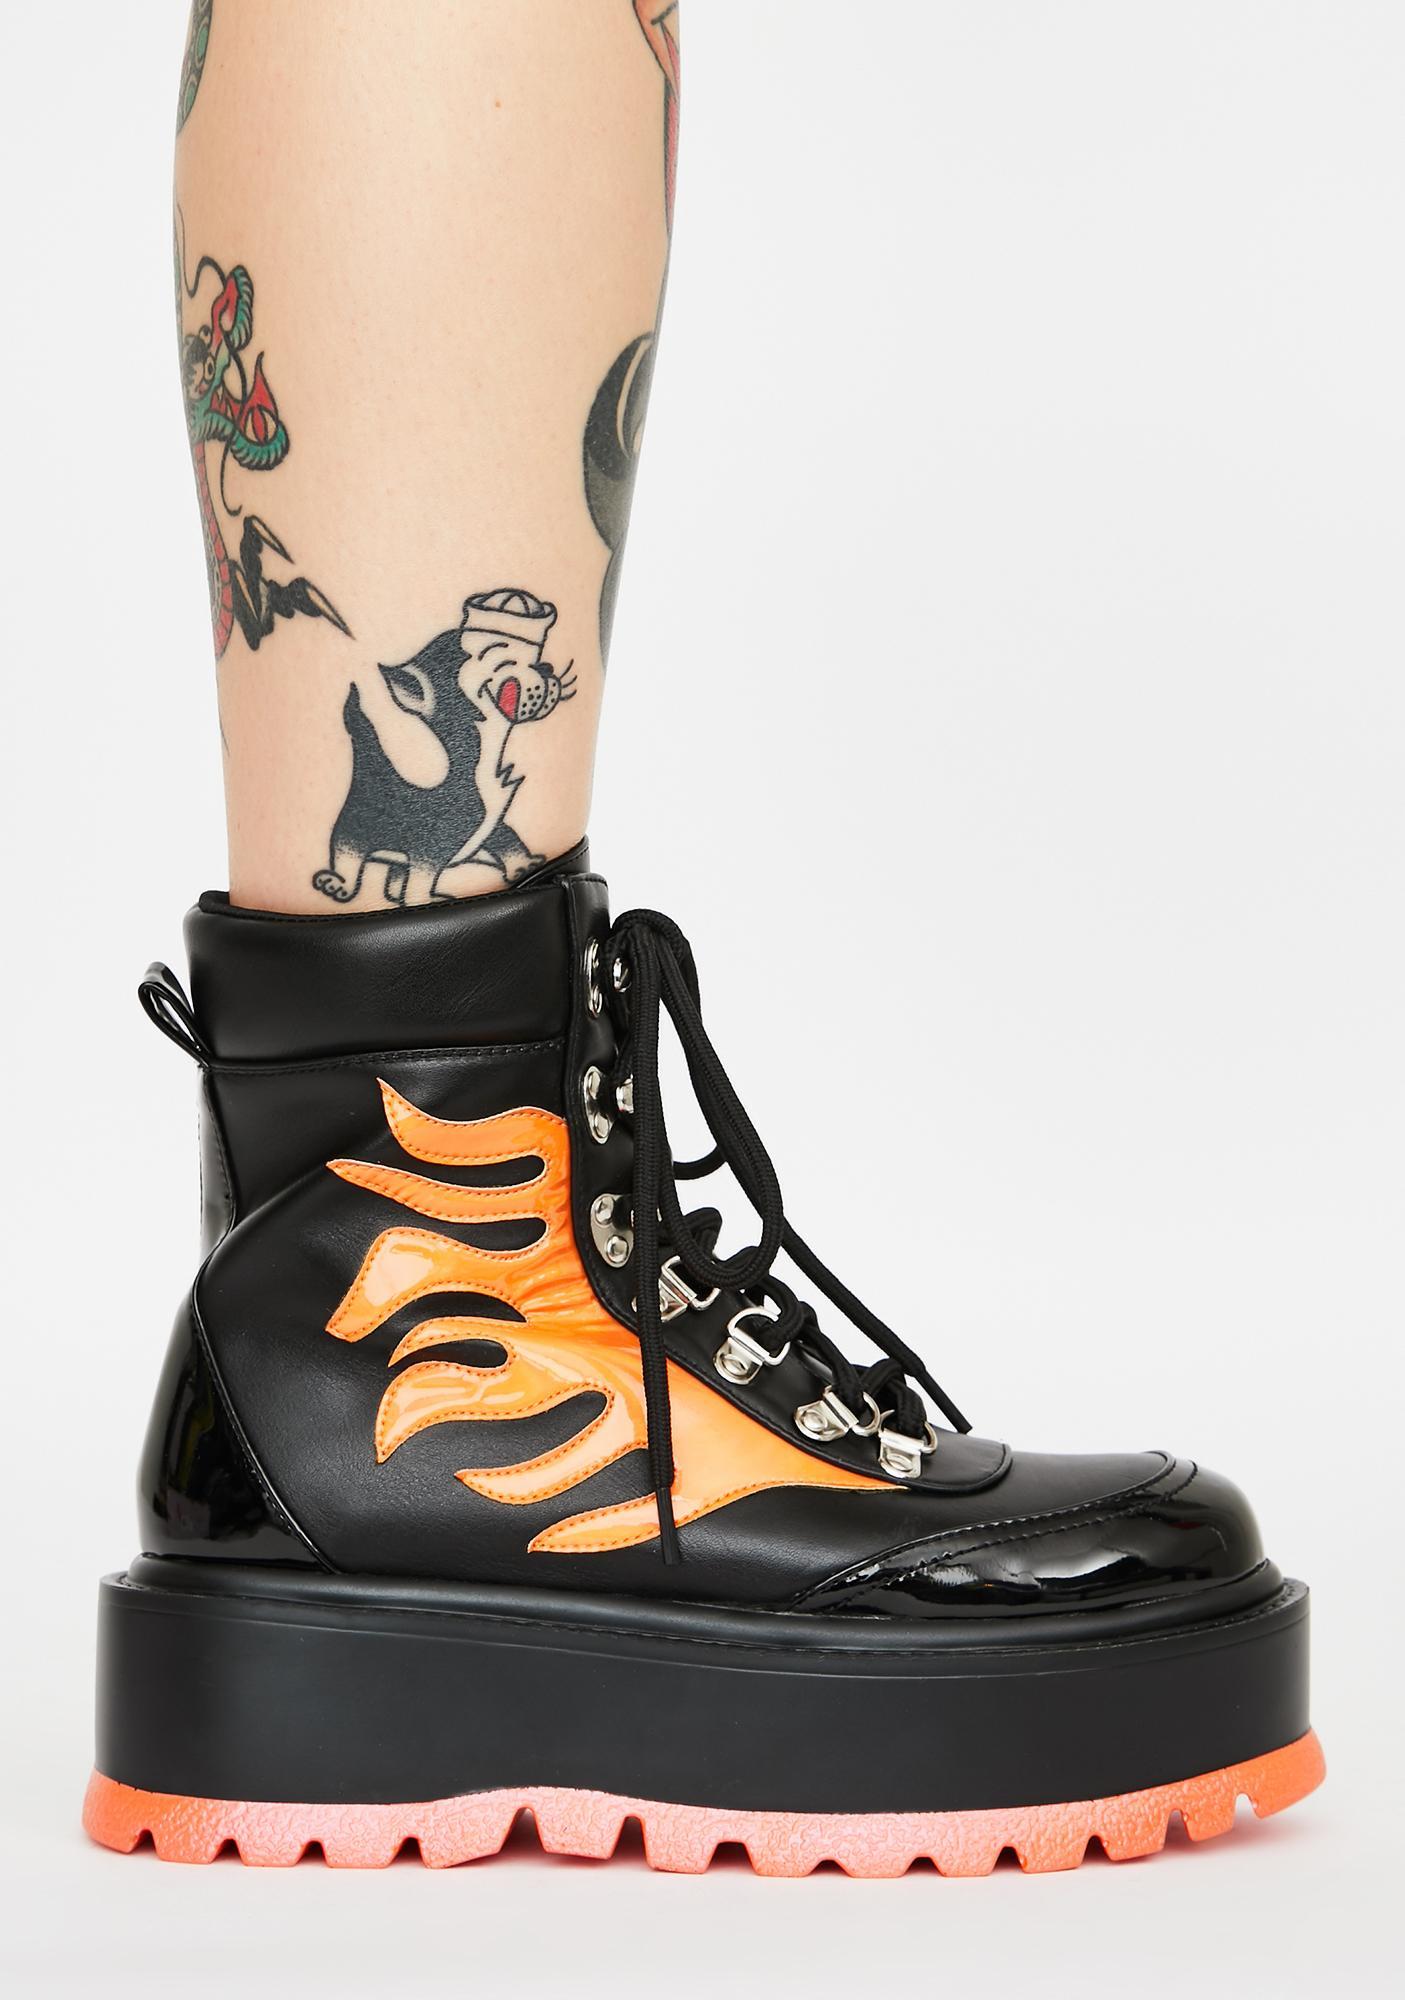 Koi Footwear Helios Flame Combat Boots